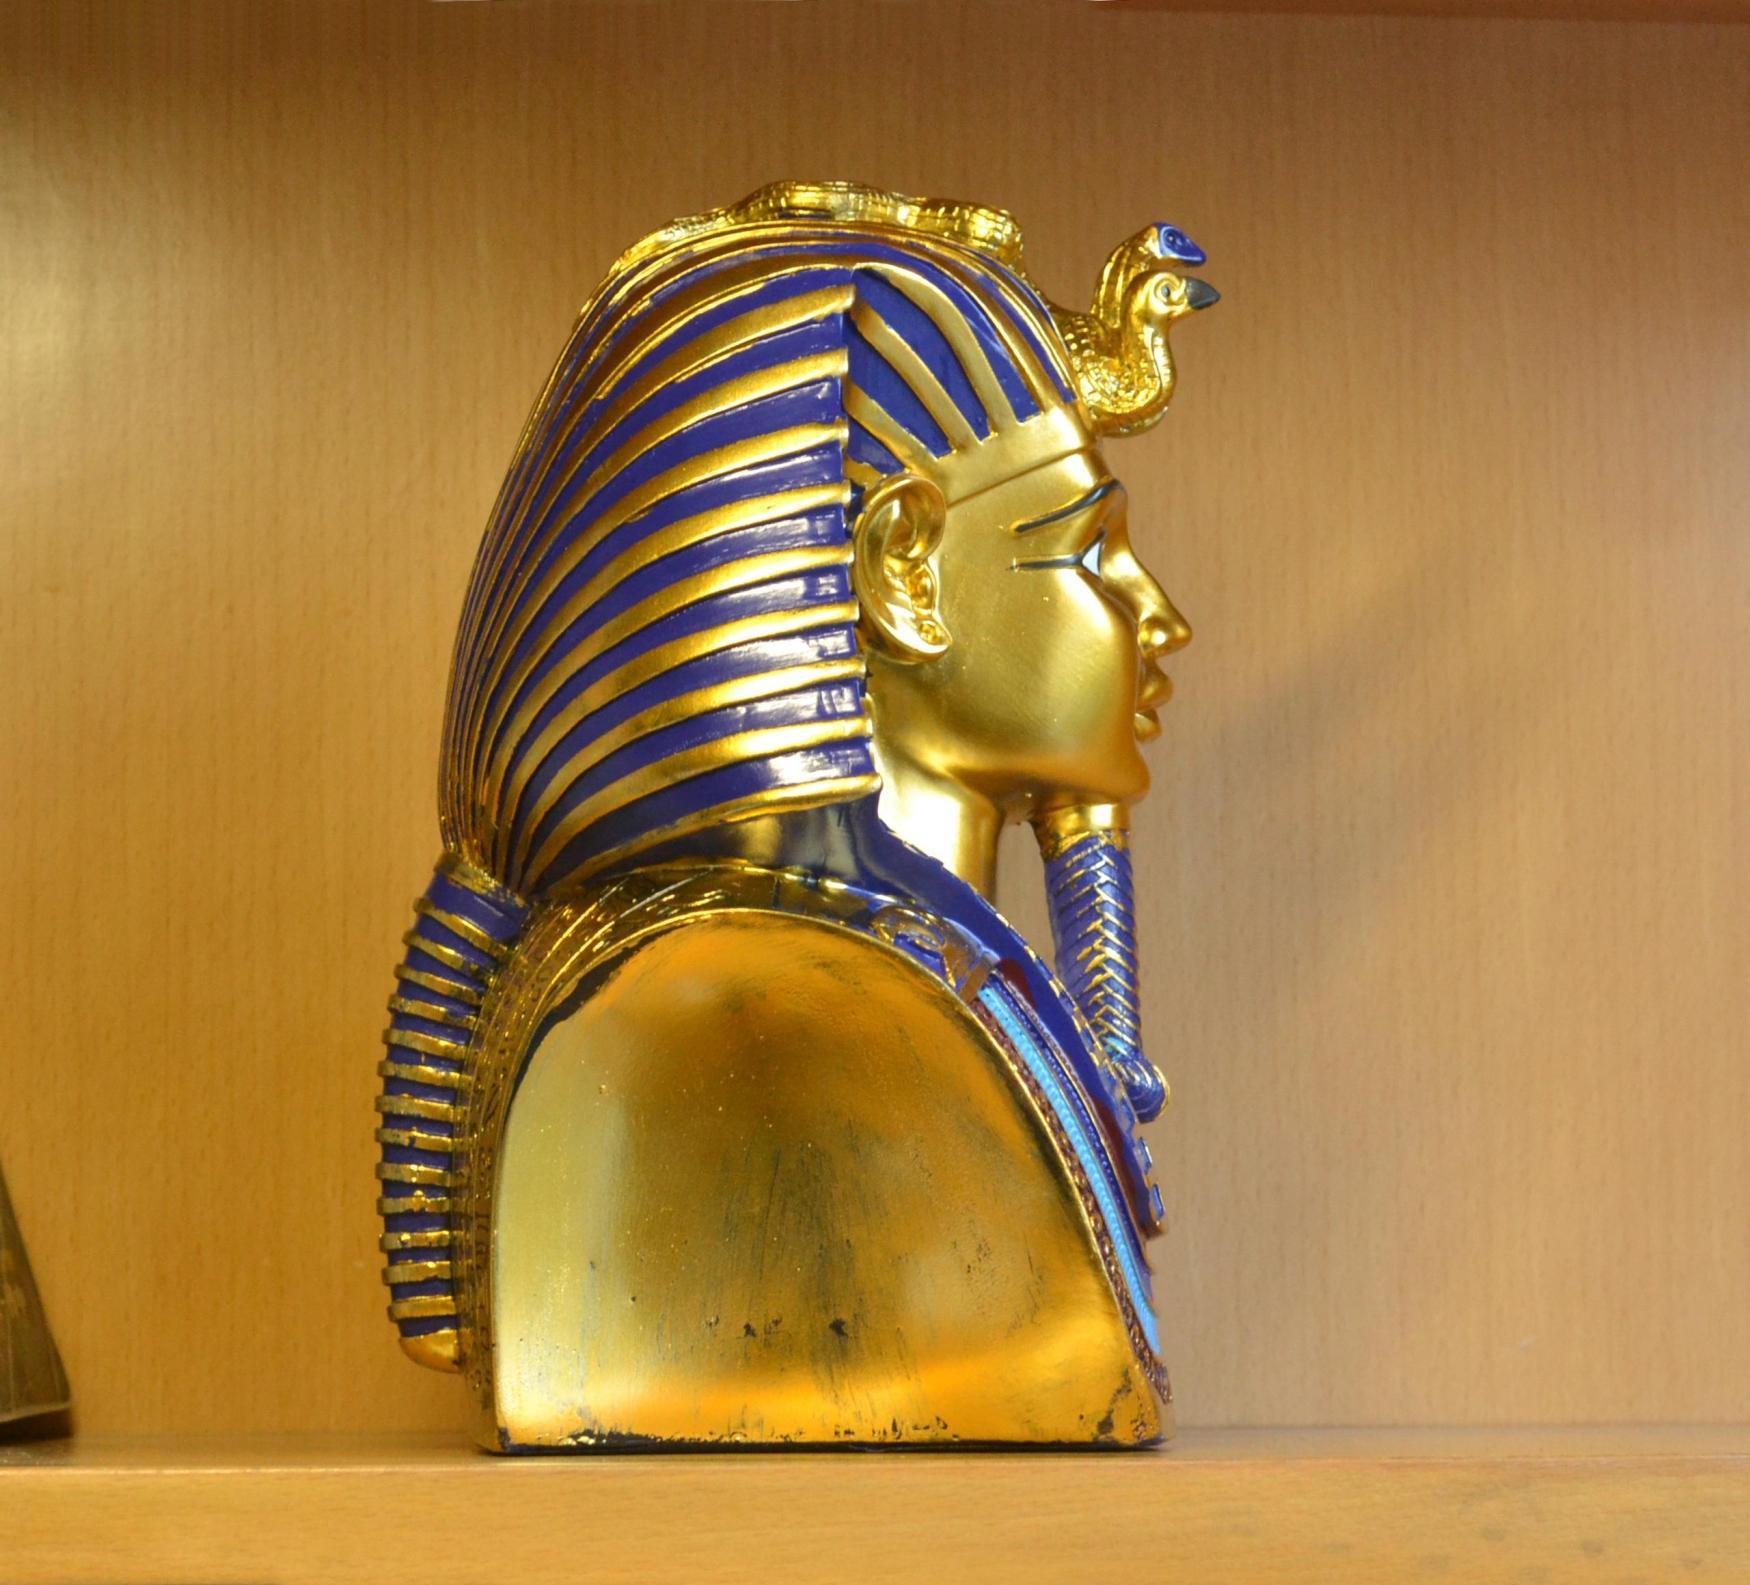 Fara N De Egipto Arte Escultura Decoraci N Artesan A Ornamento  # Muebles Egipcios